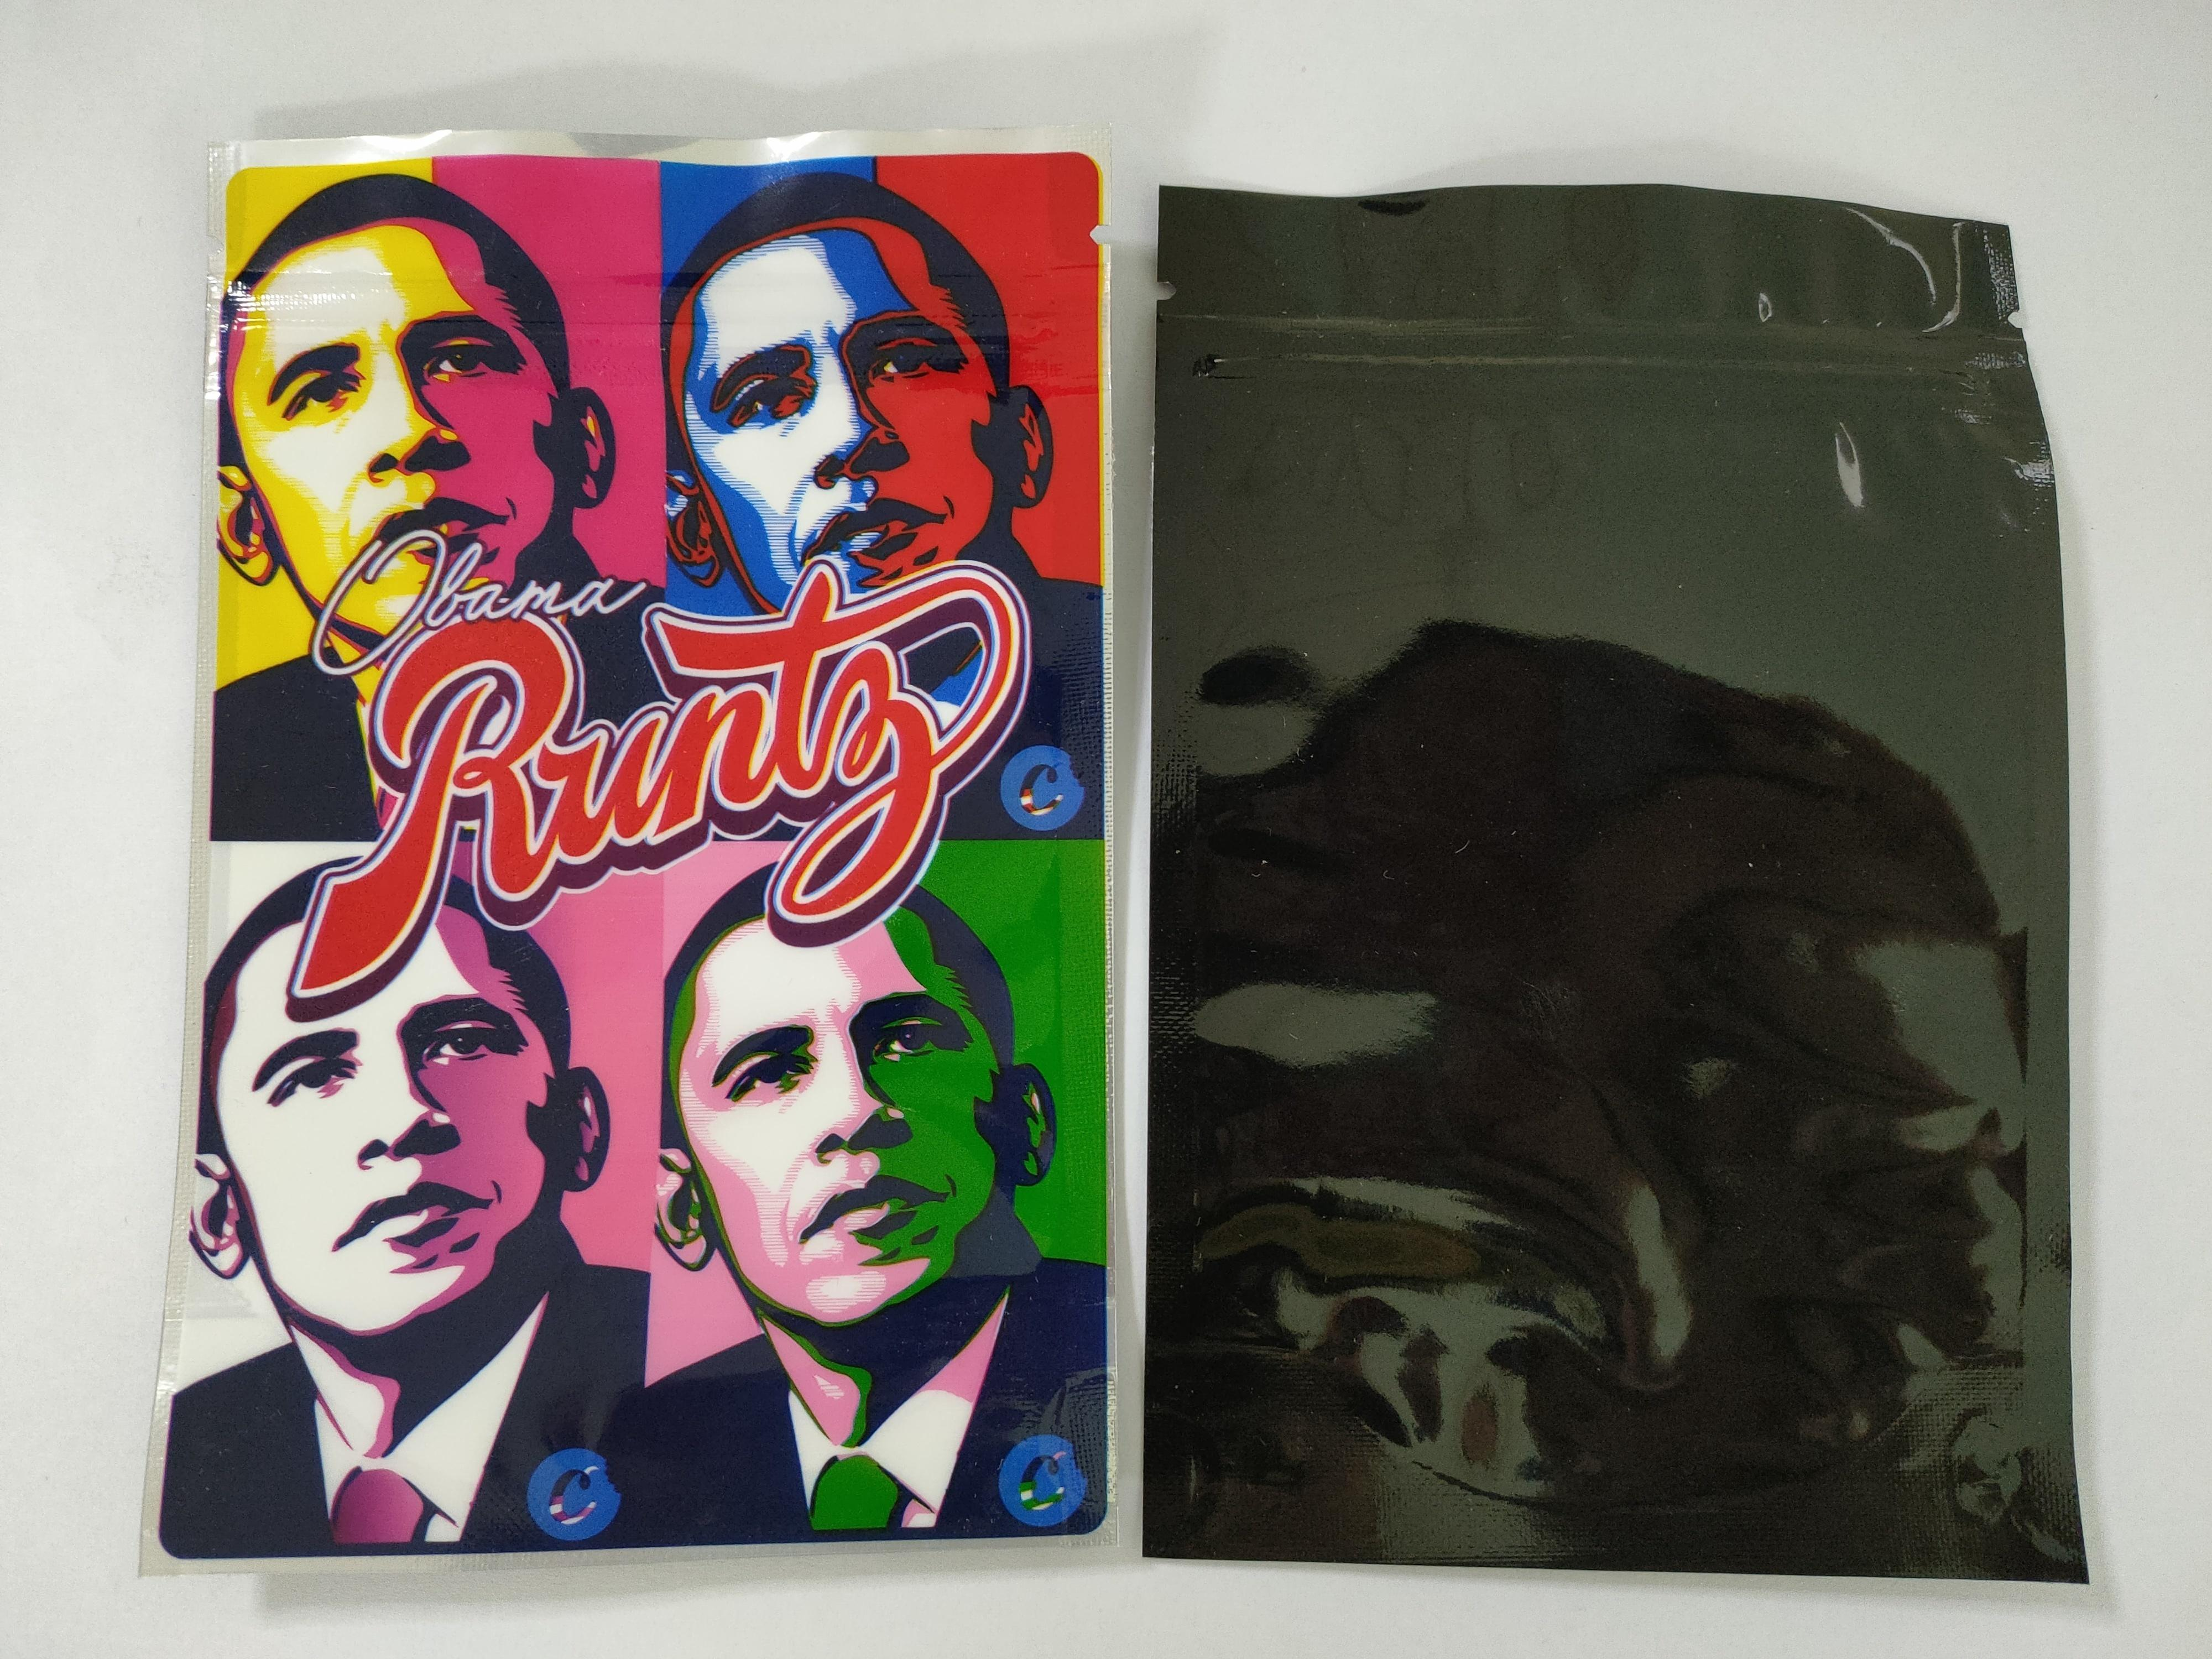 Obama Runtz Mylar Bag 3.5g Joker Up Retail Packaging Wonka Dank Gummies Chuckles Jungle Boys Package Bag Zipper Bag Vape Food Storage Bags